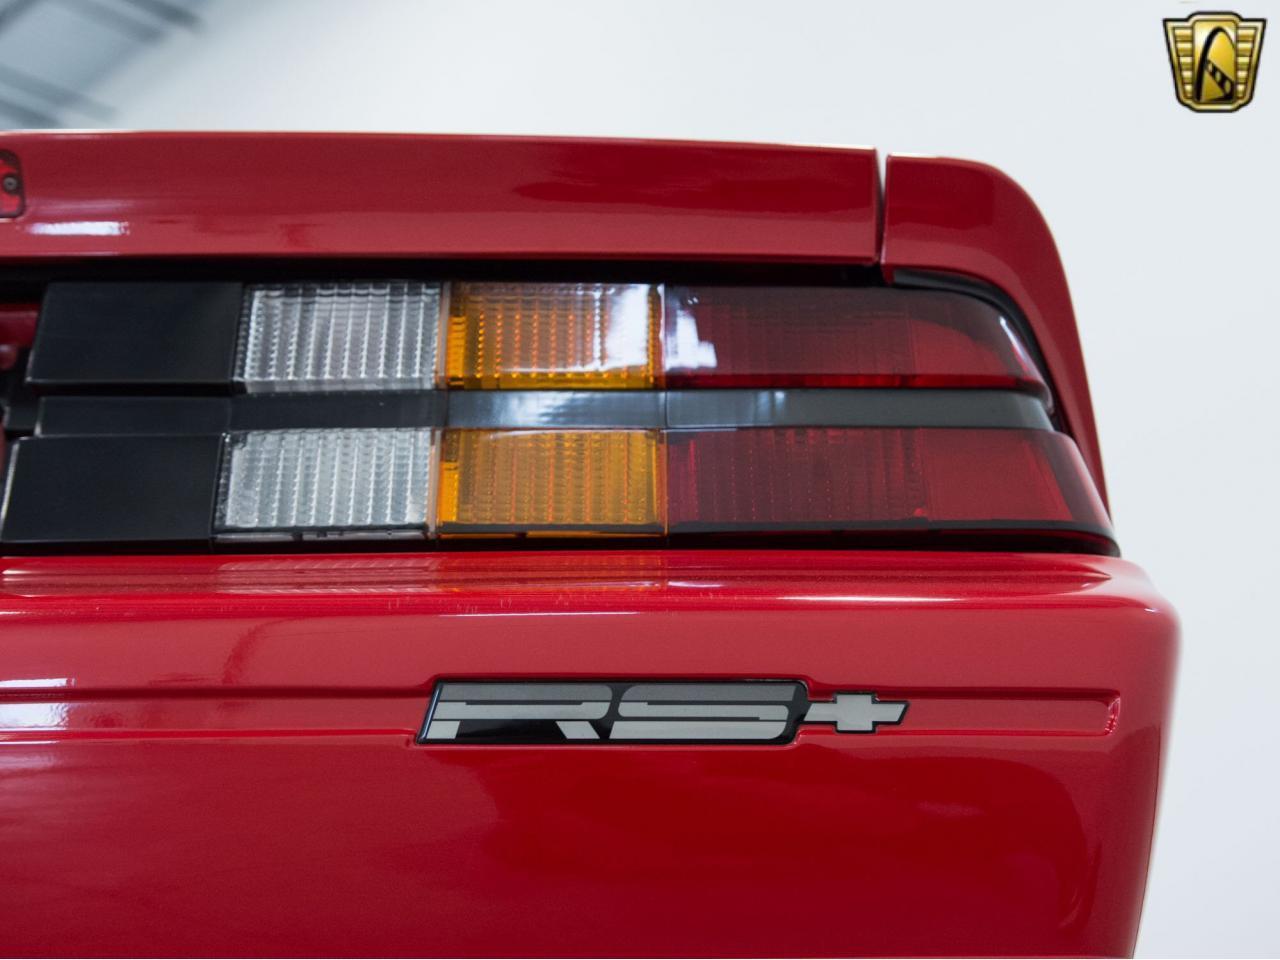 Large Picture of 1989 Chevrolet Camaro located in Kenosha Wisconsin - $17,995.00 - KE4I